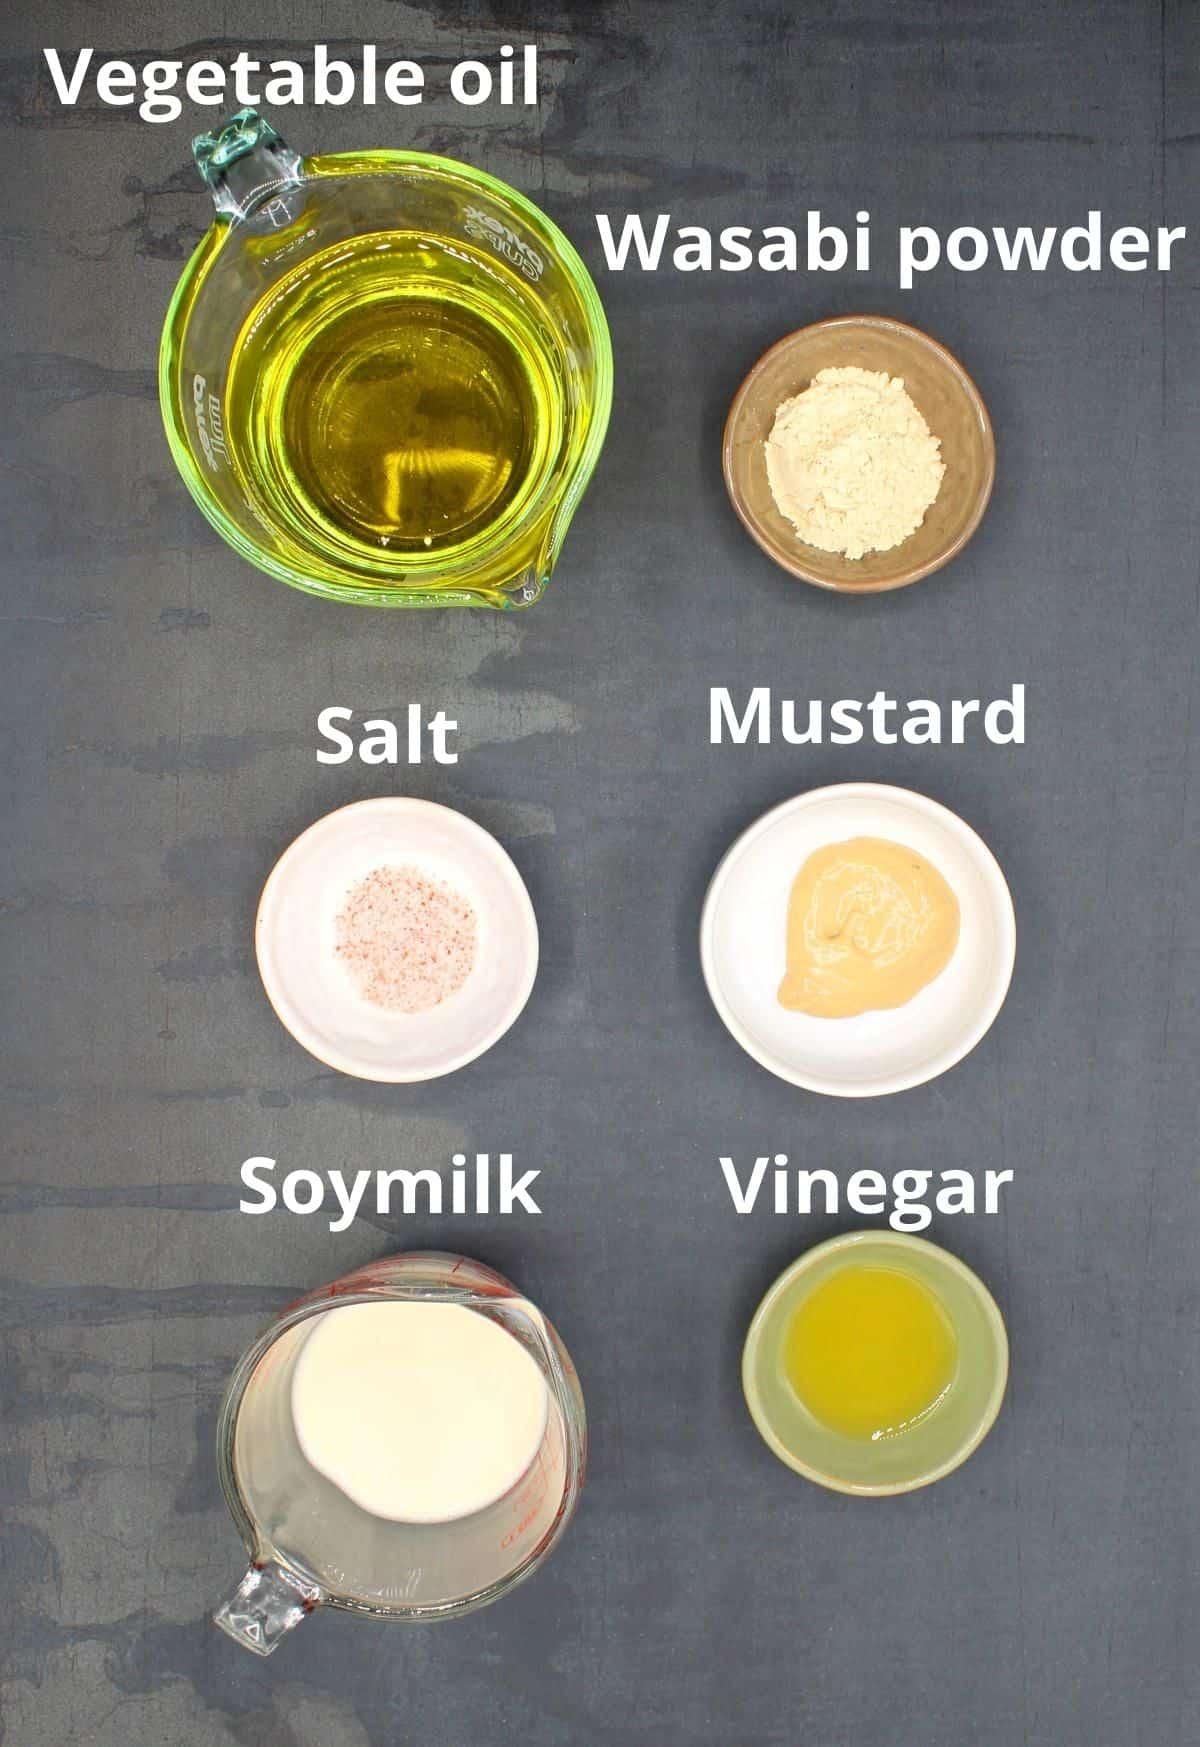 Photo of ingredients for vegan mayonnaise including oil, soymilk, vinegar, mustard, wasabi and salt.